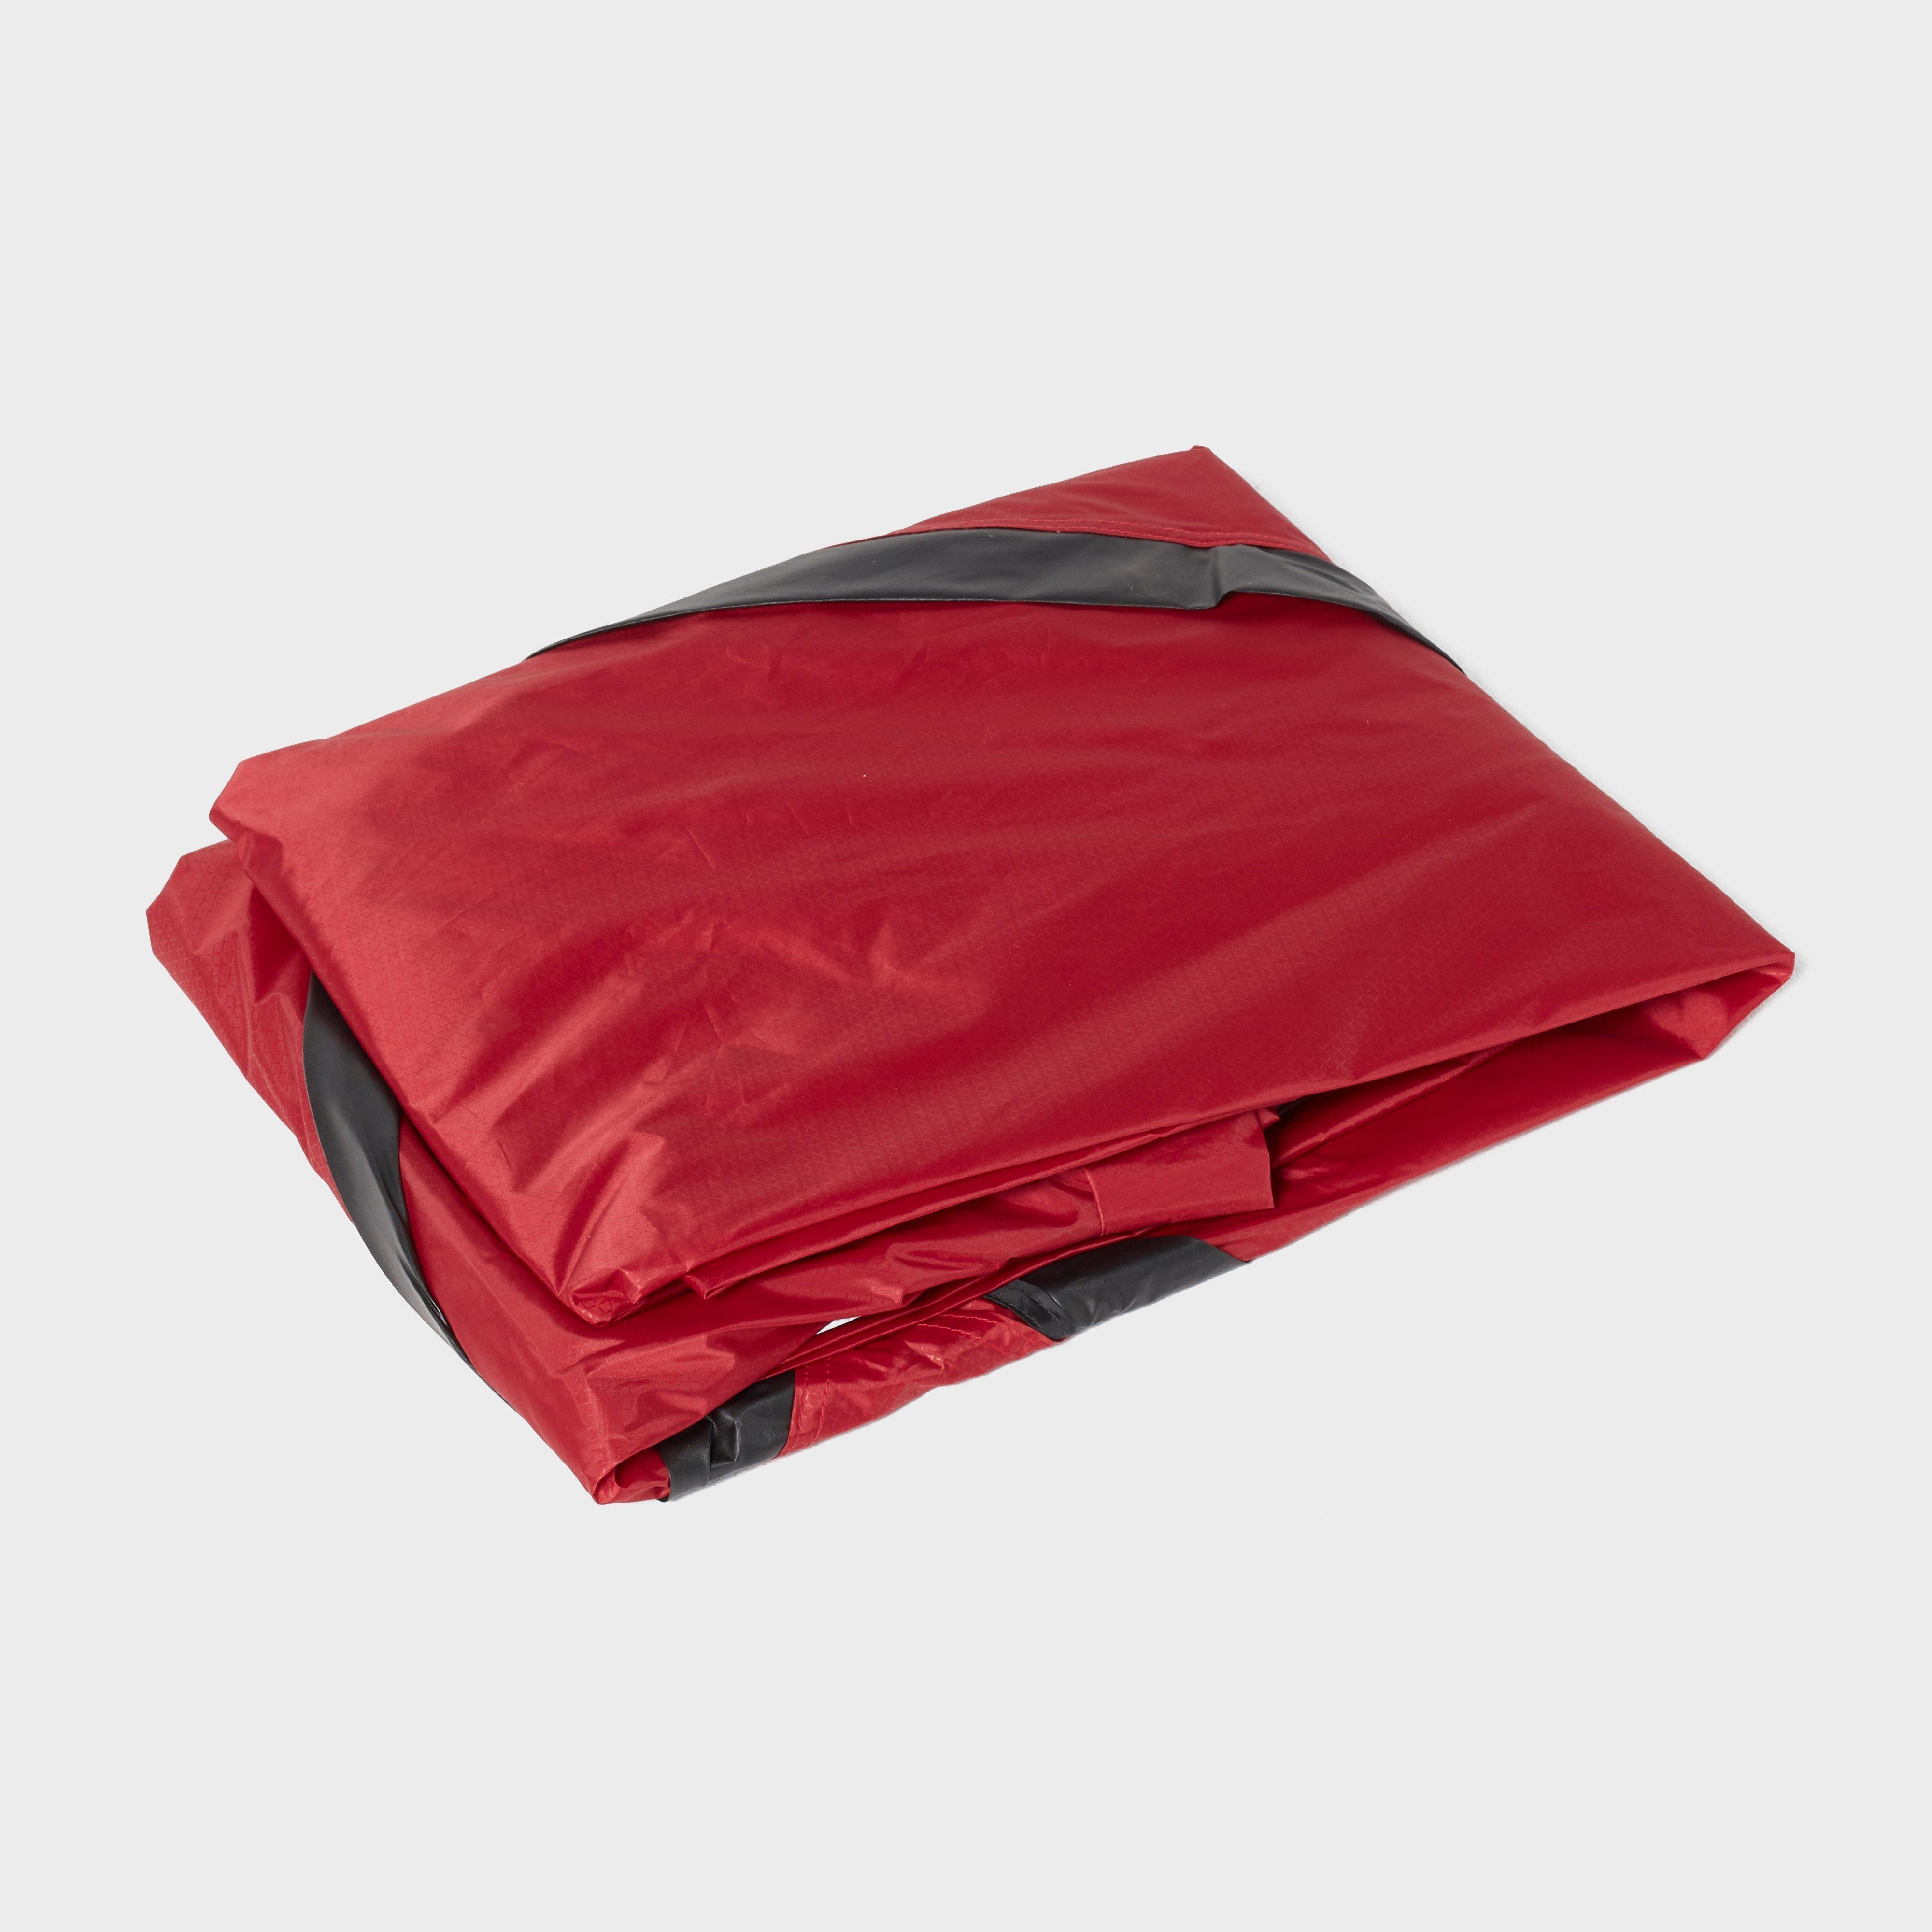 Oex Bandicoot Ii Spare Flysheet - Red/Flysheet, Red